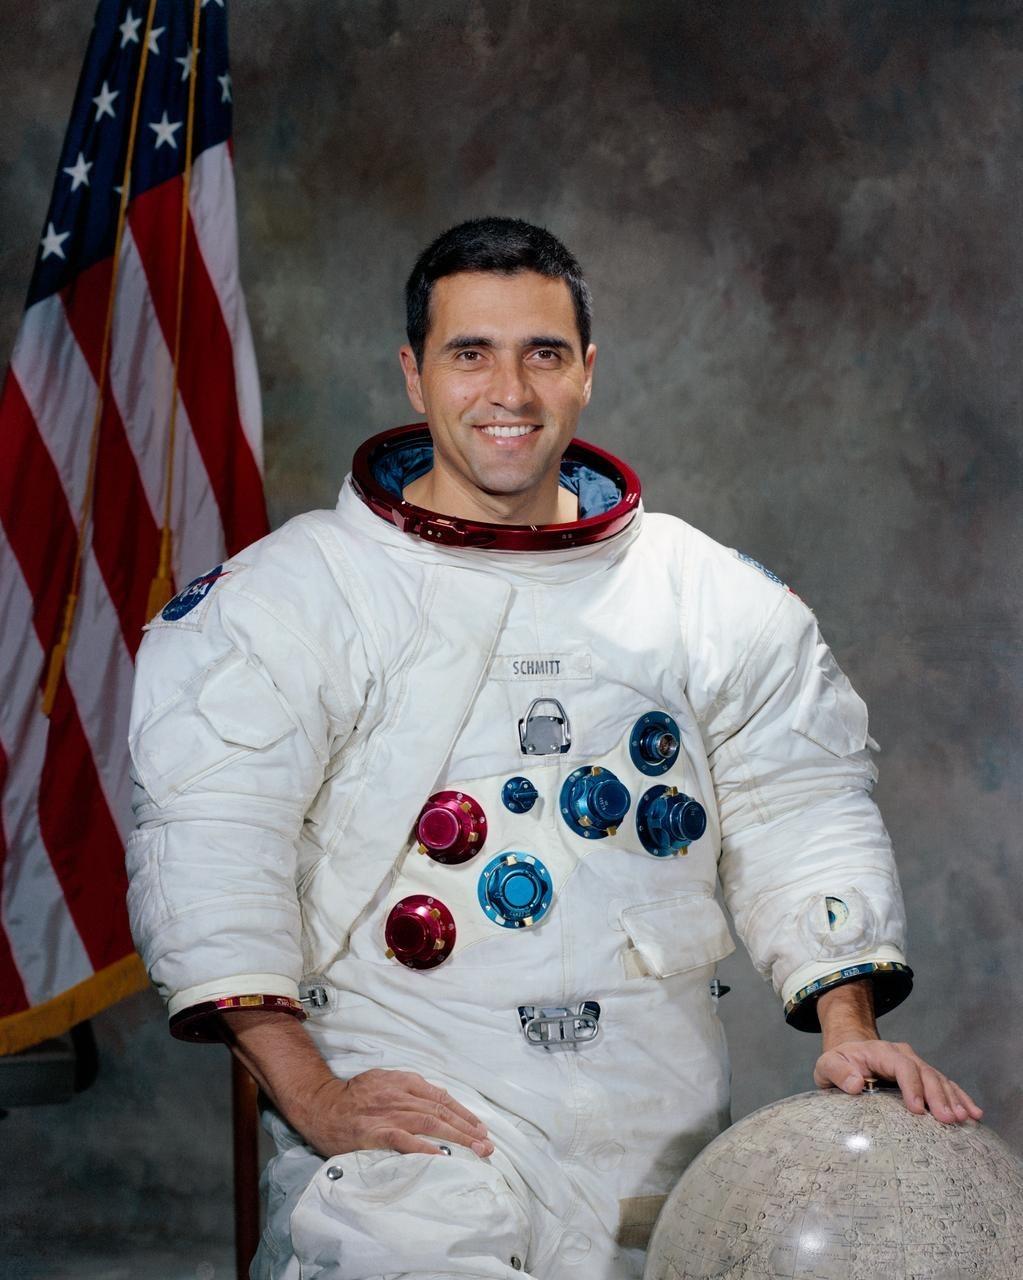 Apollo 17 astronaut Harrison Schmitt will be a featured VIP at Apollopalooza in Denver, CO.